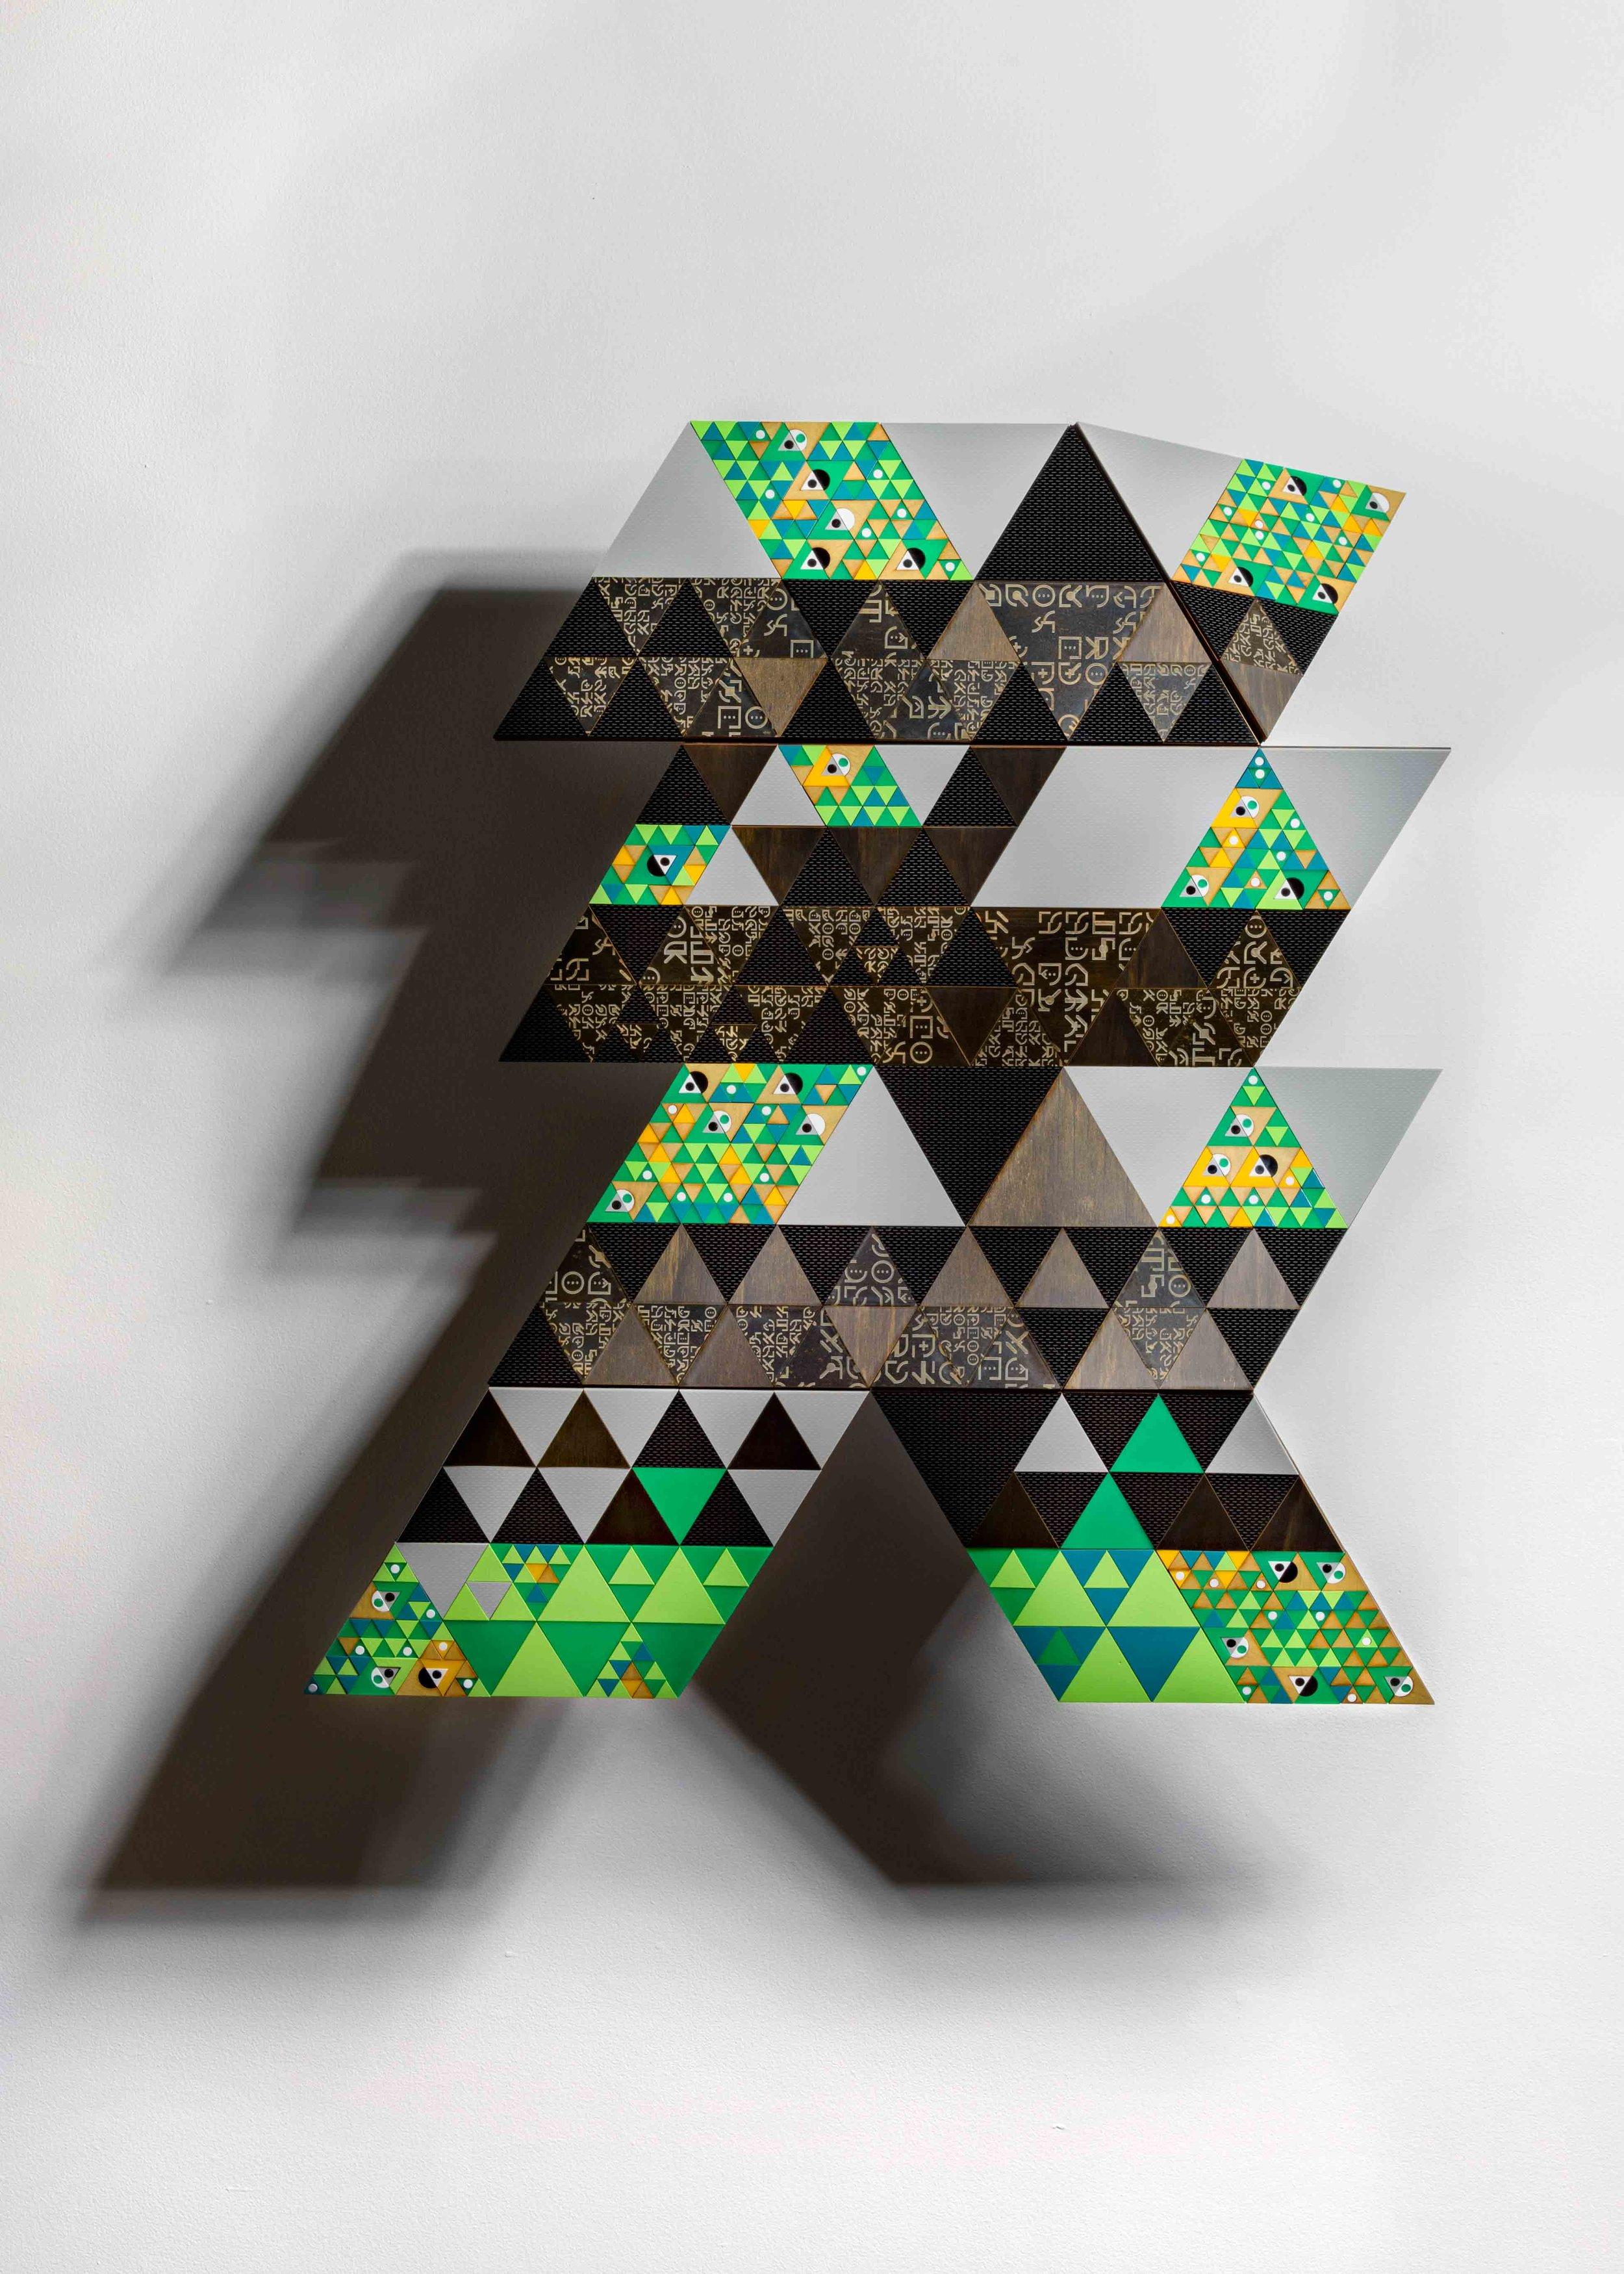 Troy Innocent,  Decision Tree , 2016, Laser cut plywood, 64 x 88 x 12cm